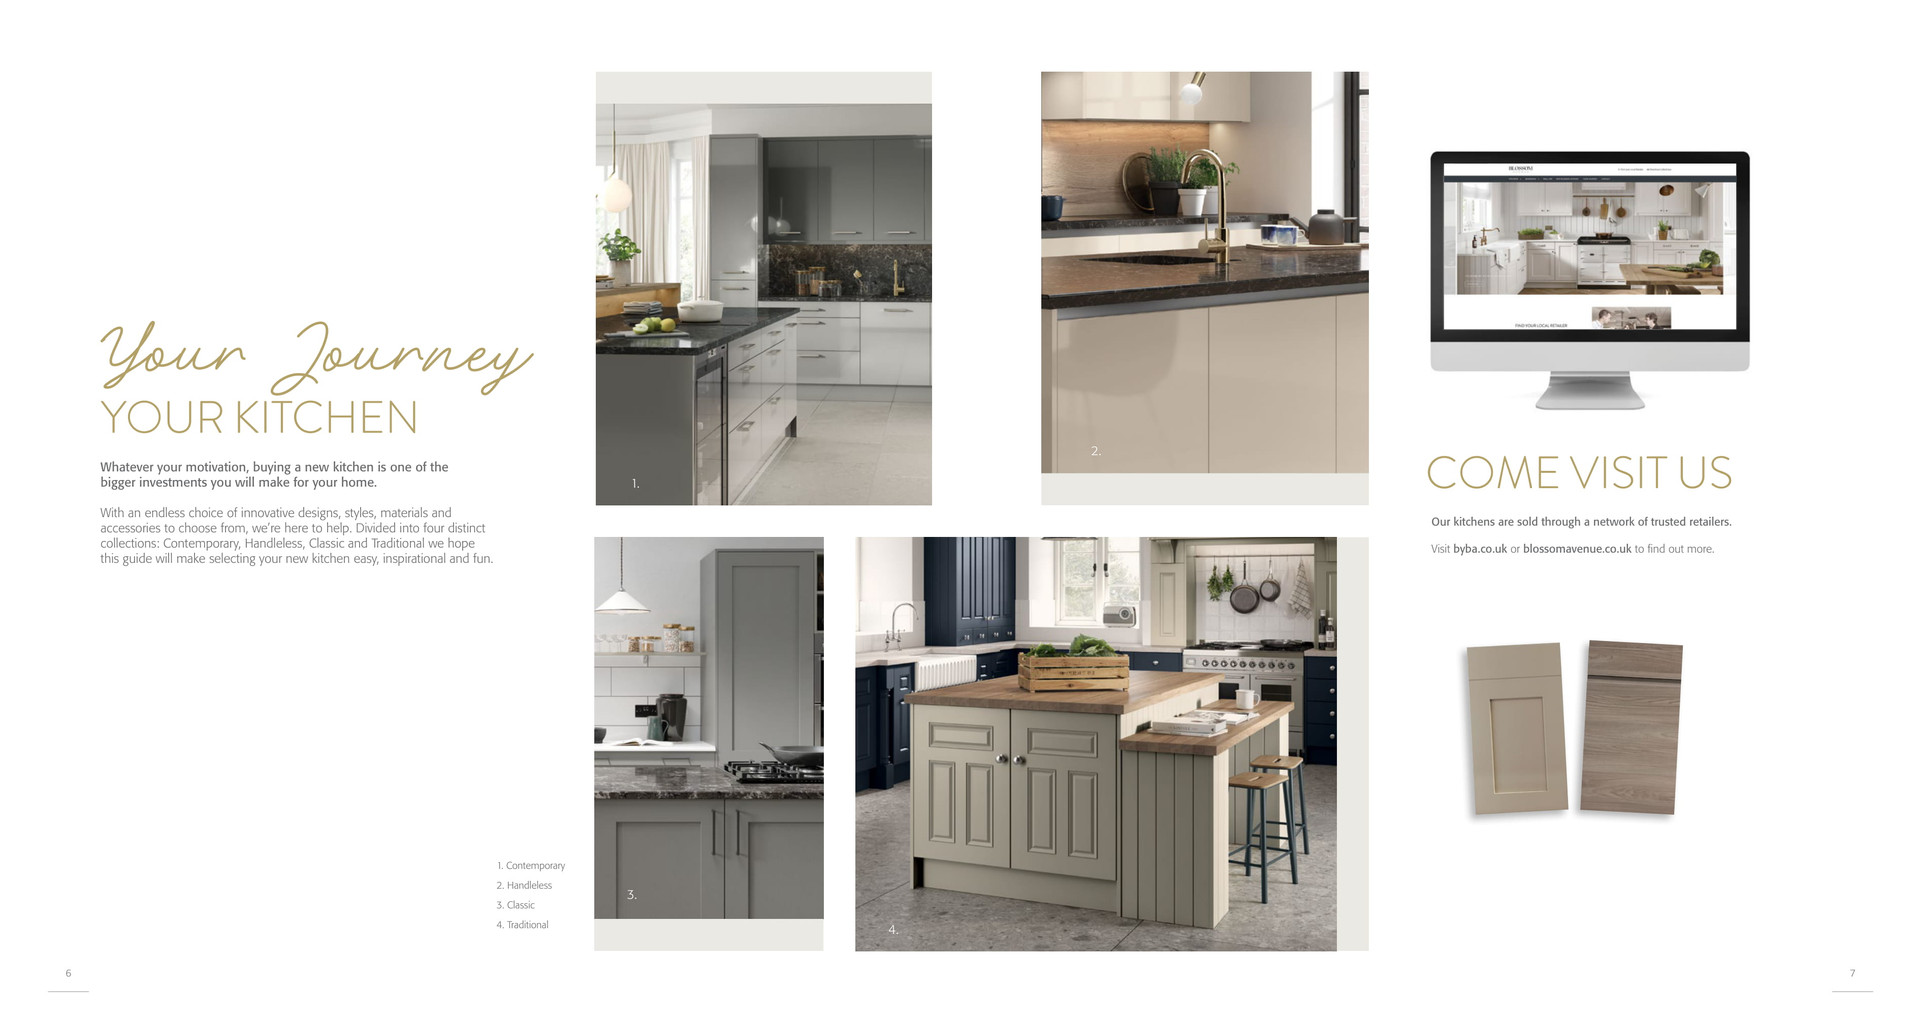 blossom-avenue-kitchen-brochure-2020-04.